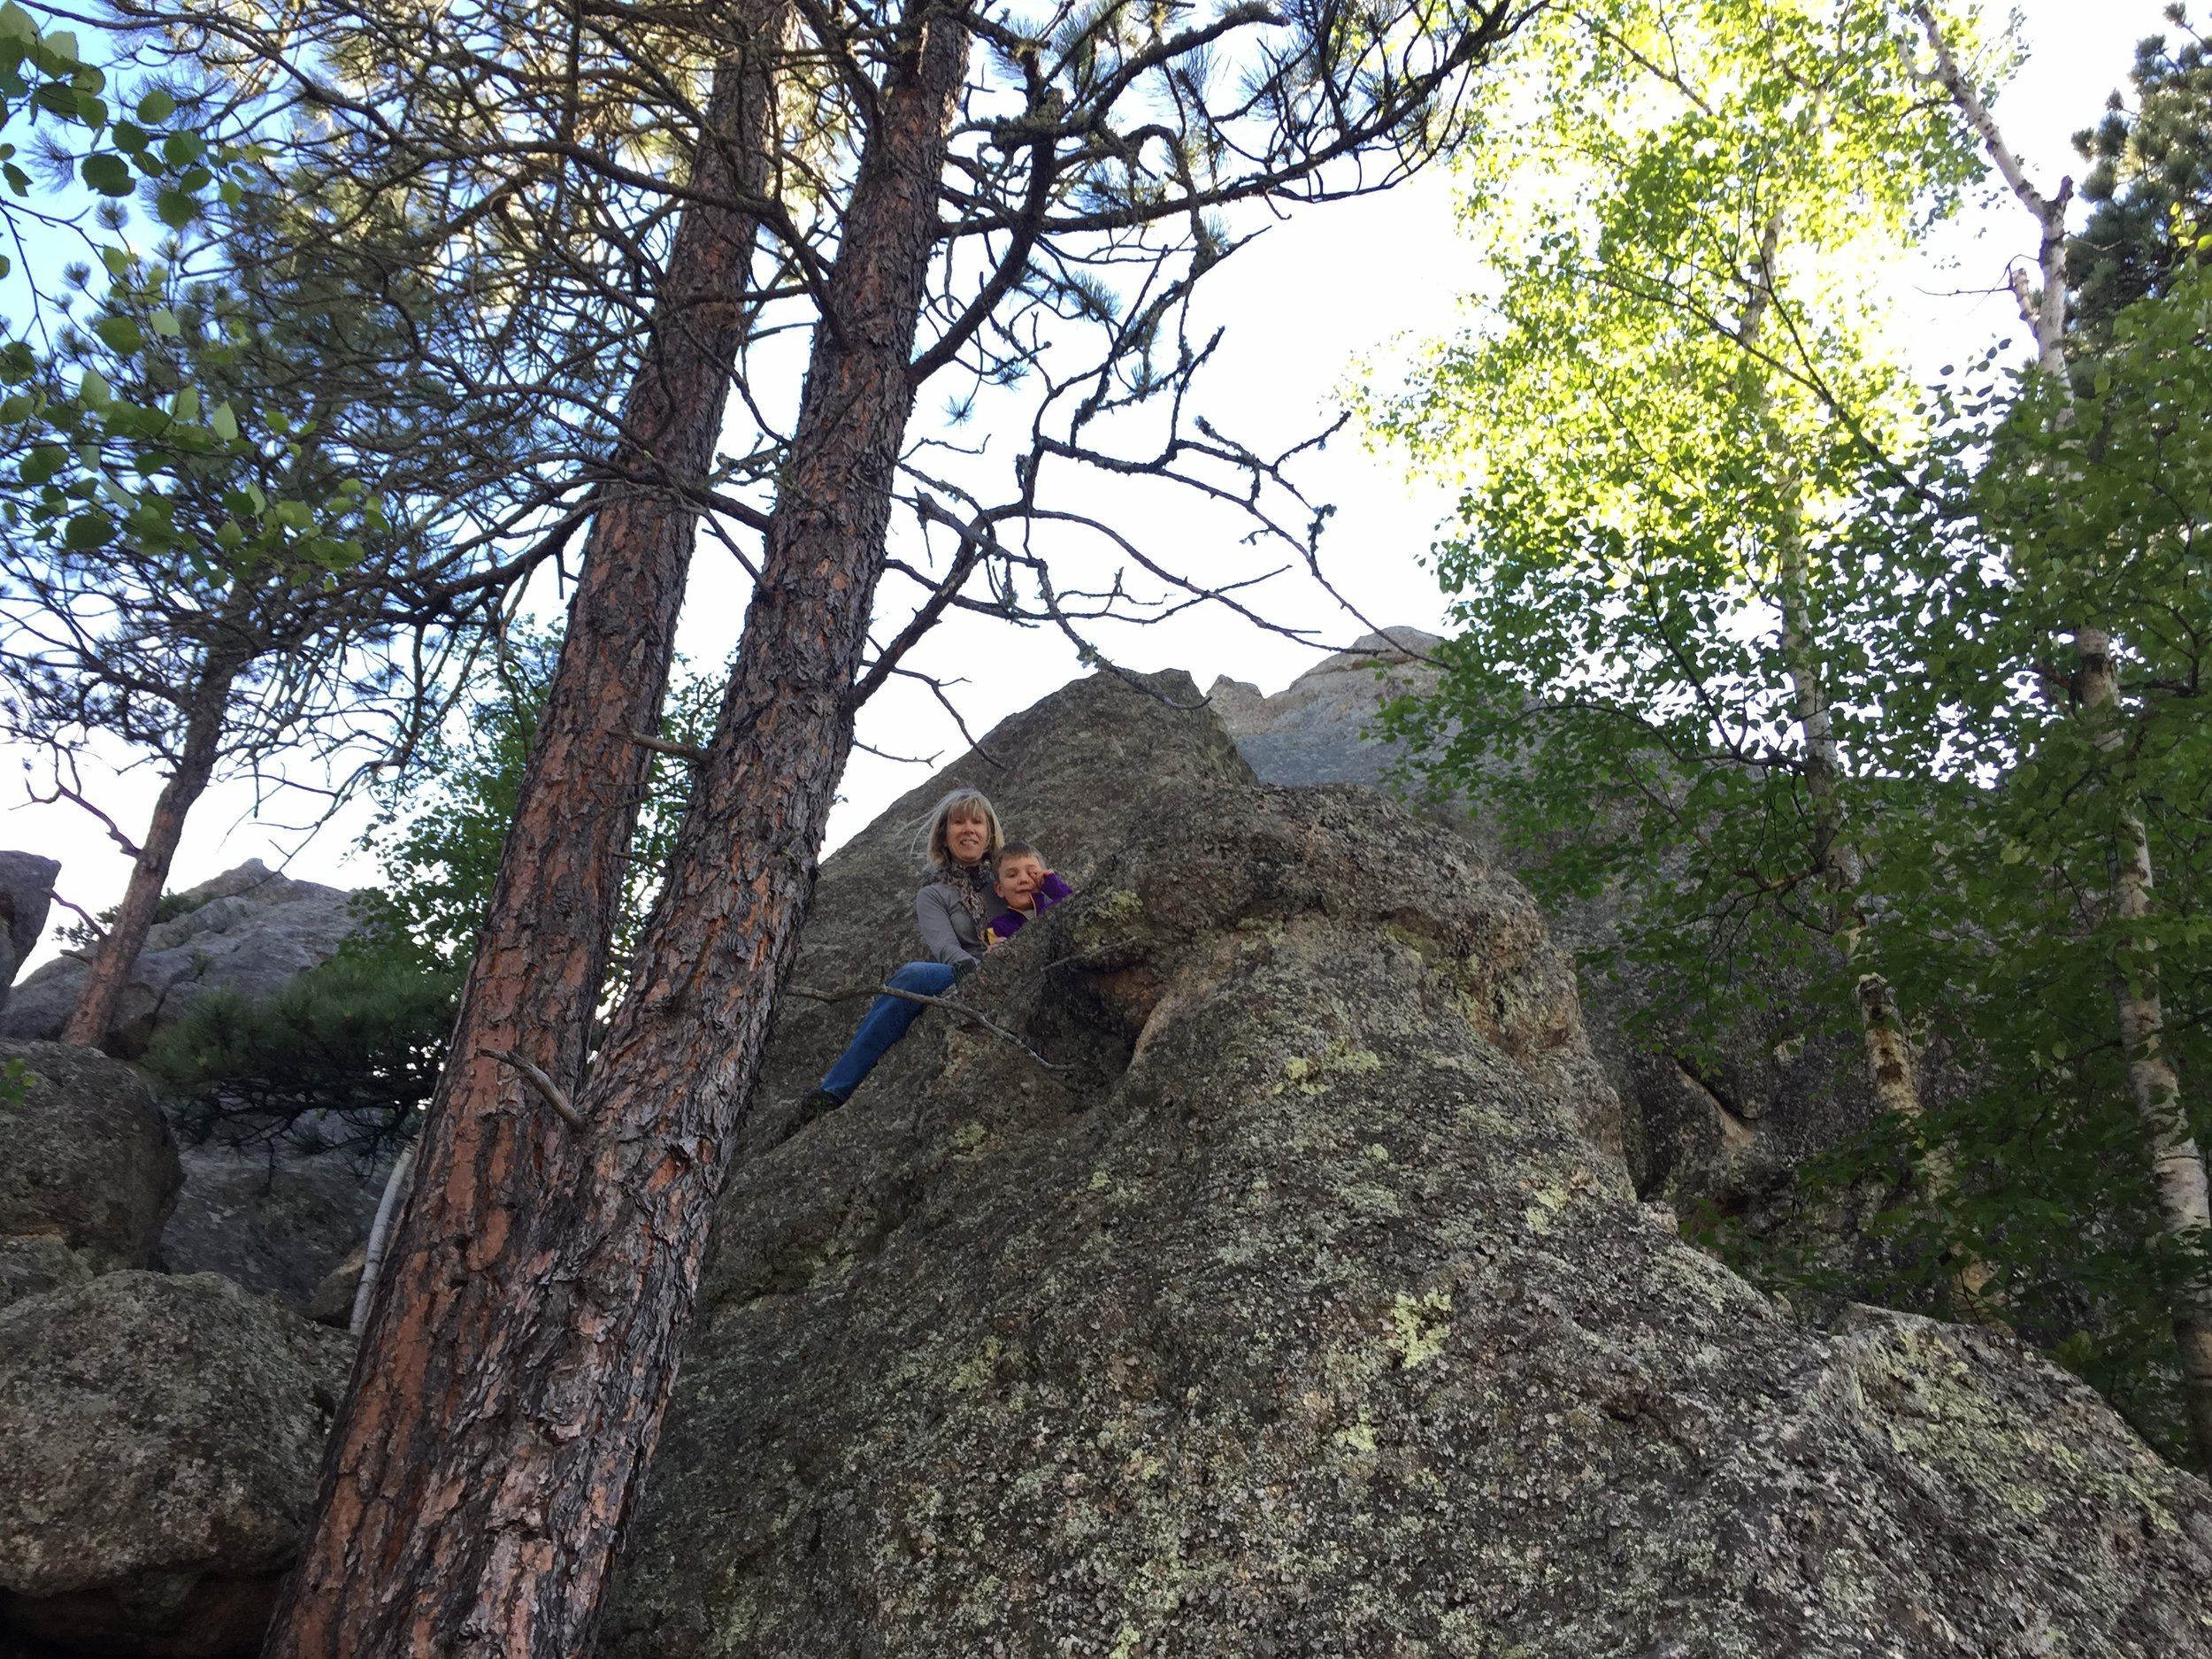 Climbing around campsite